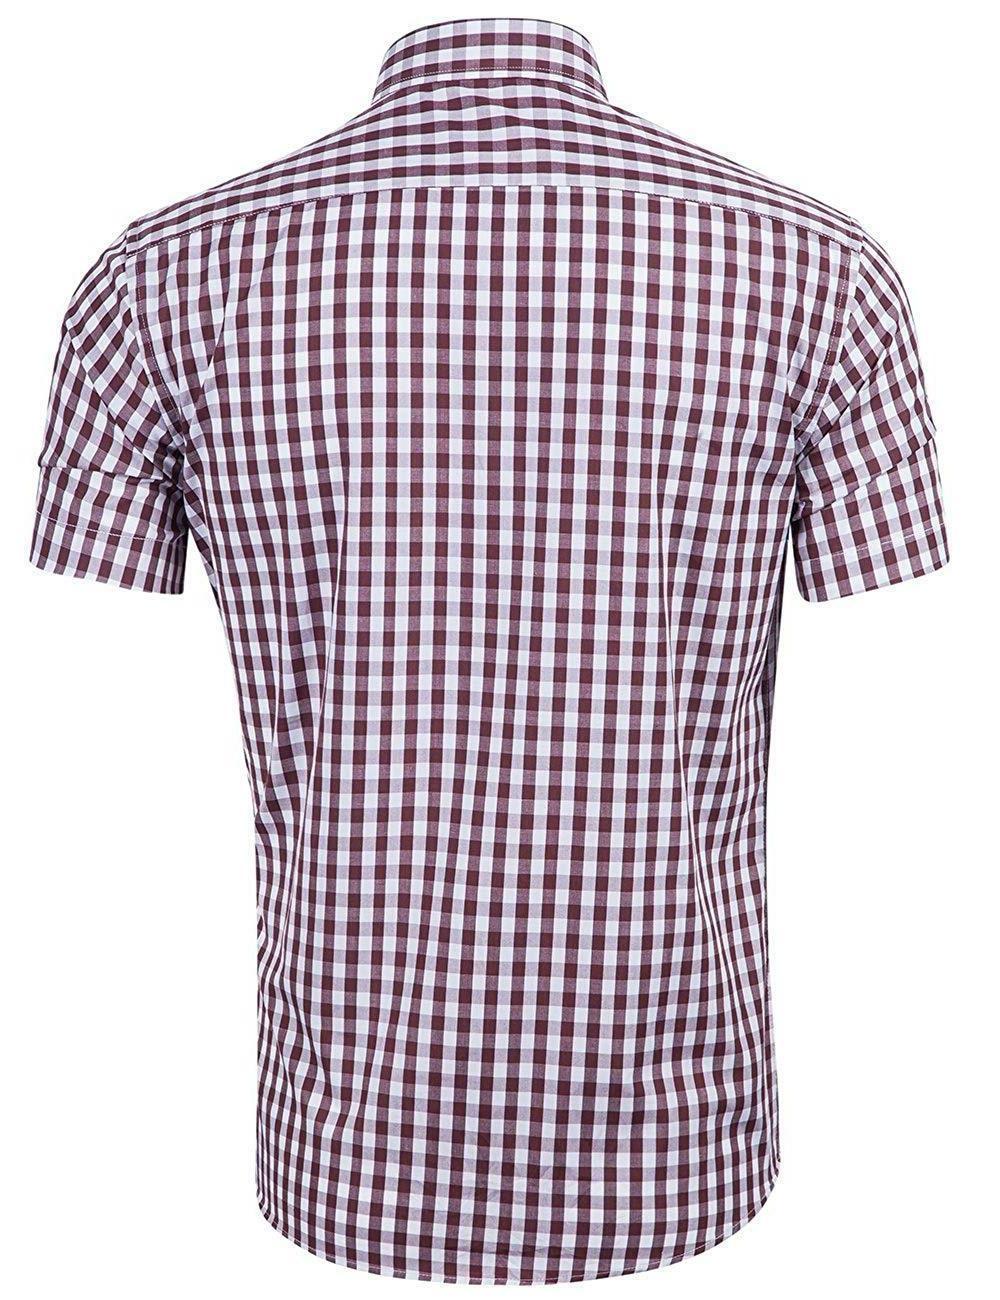 XI Casual Cotton Plaid Gingham Short Sleeve Dress